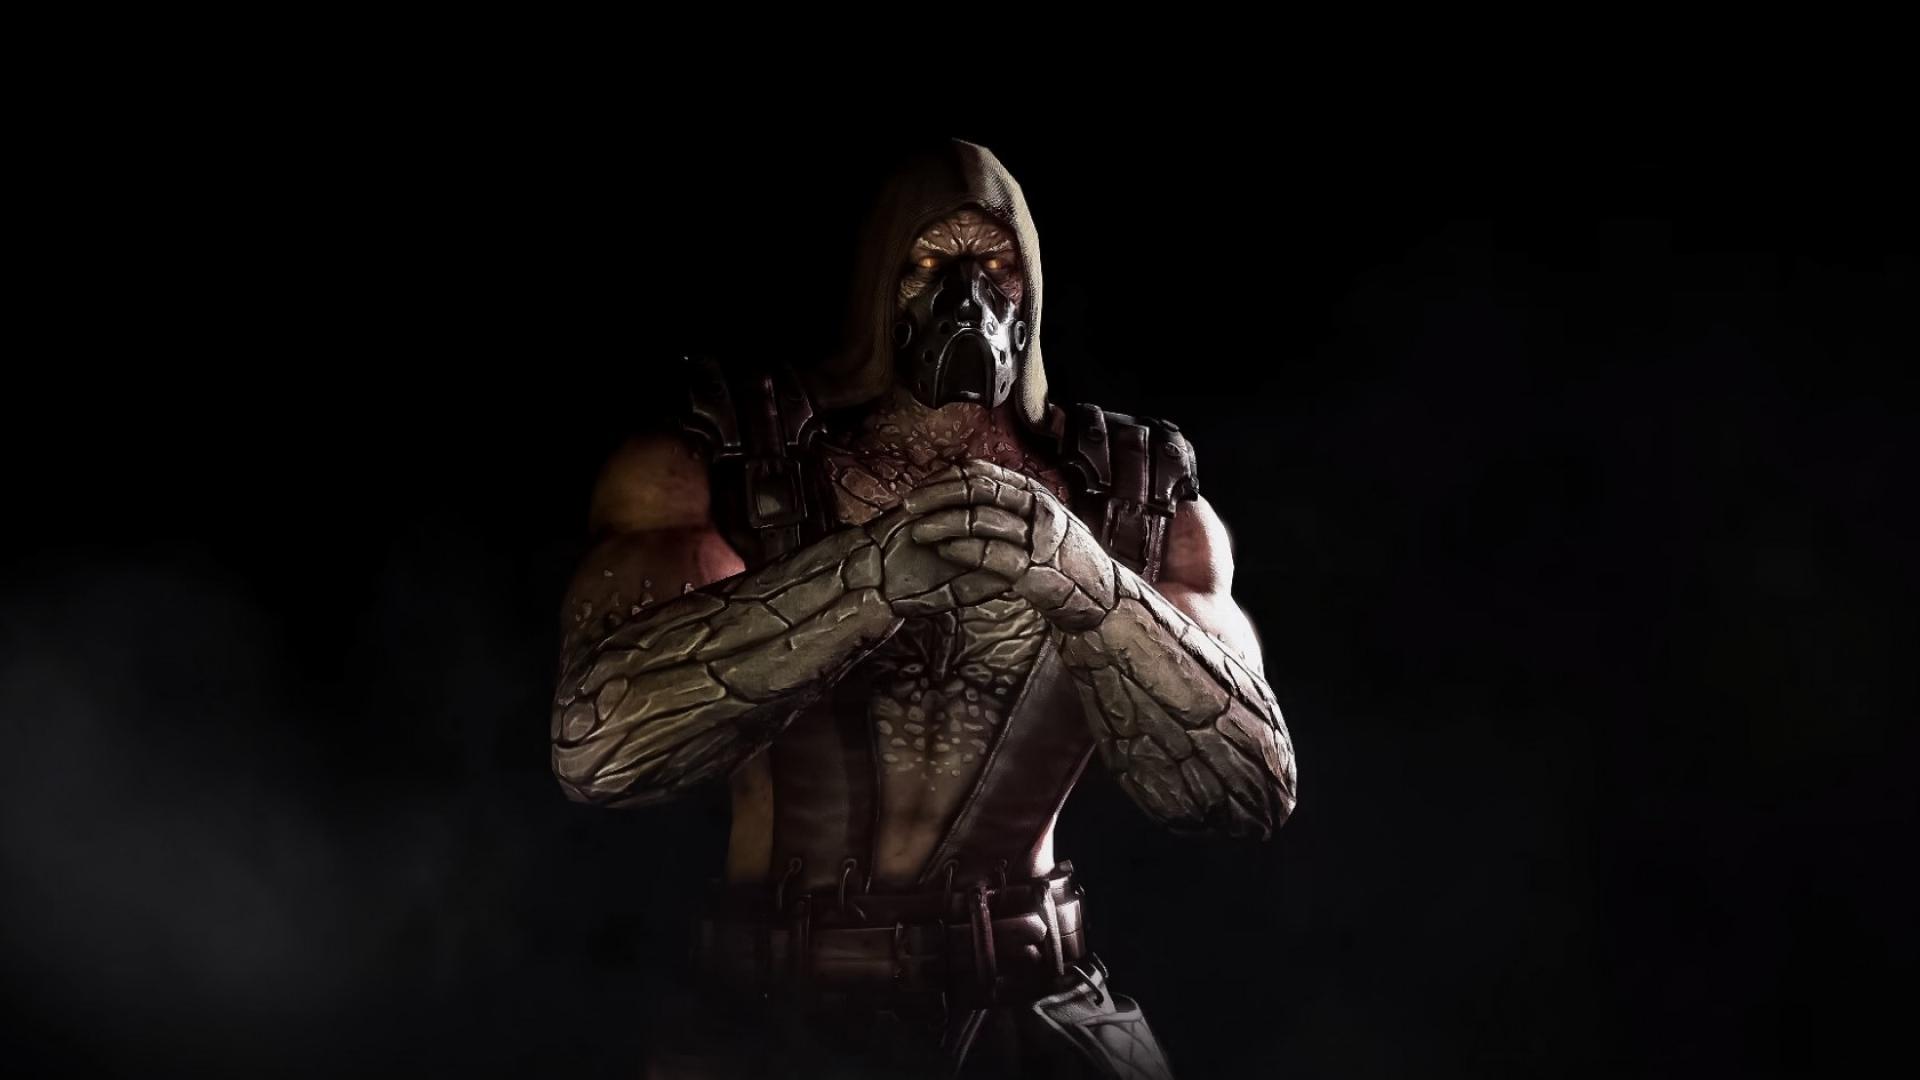 Download Tremor Mortal Kombat X HD Wallpaper Search more Games high 1920x1080